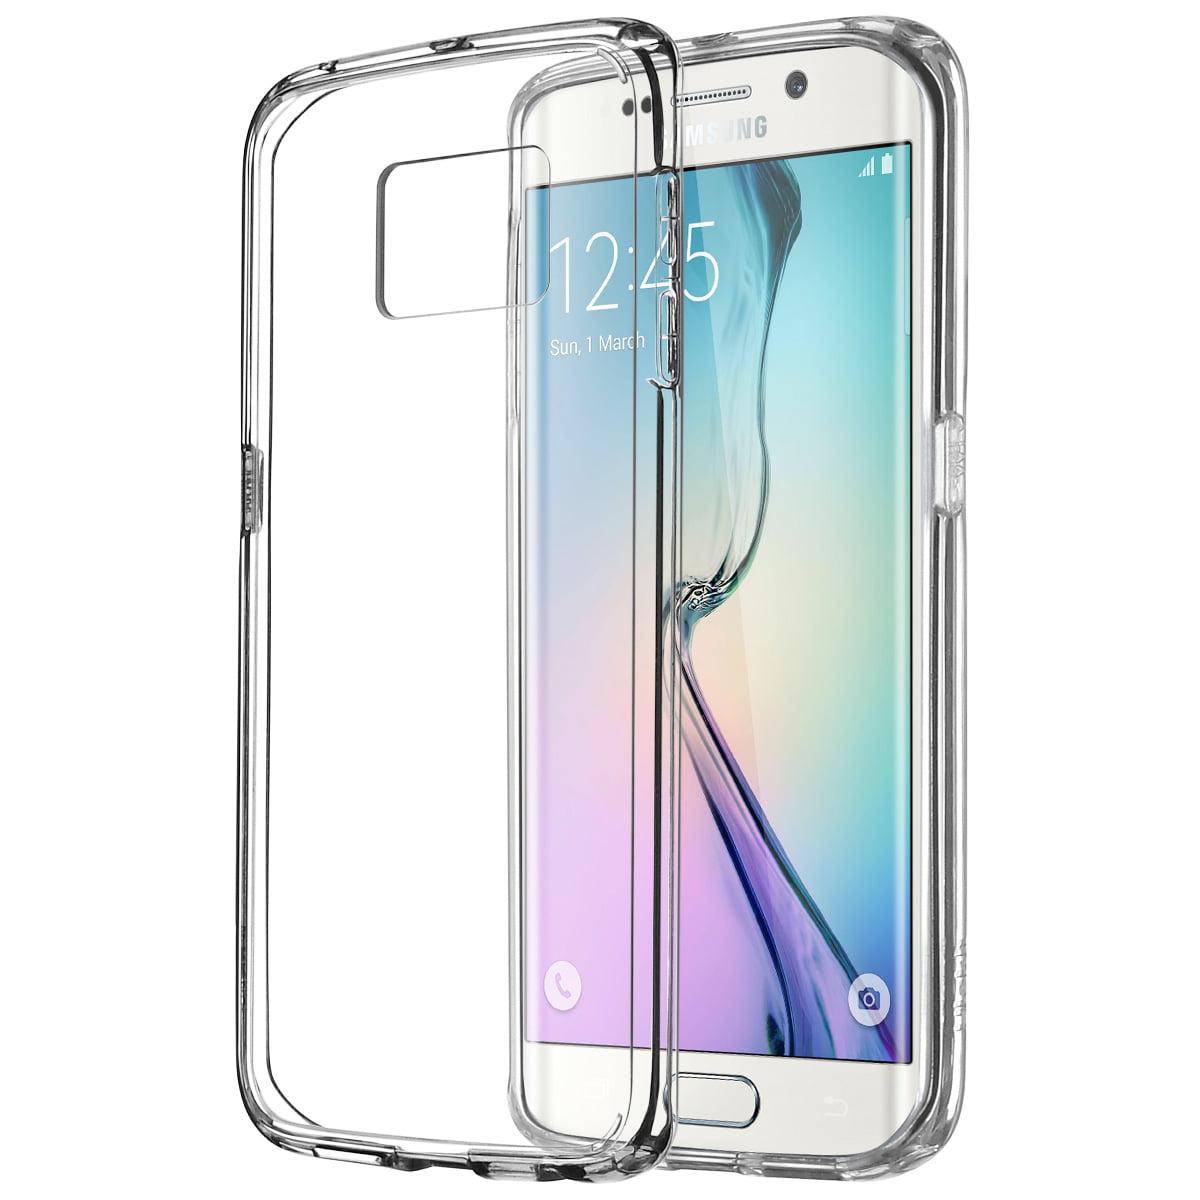 Galaxy S6 Edge Case, ULAK [CLEAR SLIM] Premium Back Absorption Bumper Hard TPU Cover for Samsung Galaxy S6 Edge - Crystal Clear